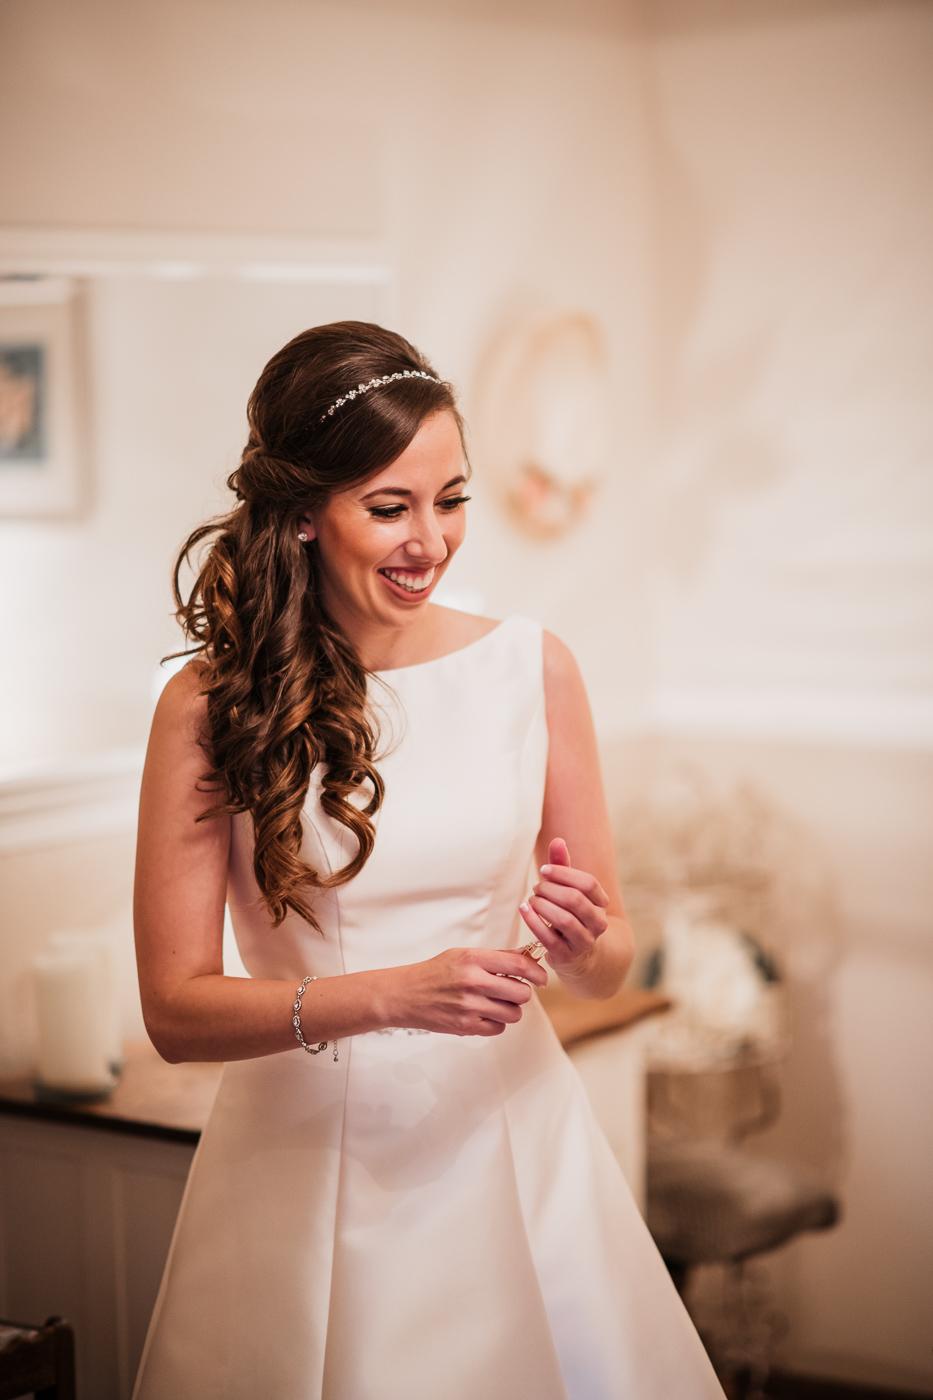 Candice Rawlin Wedding PHOCO Photography Pines Genesee Golden Colorado Fog -3.jpg